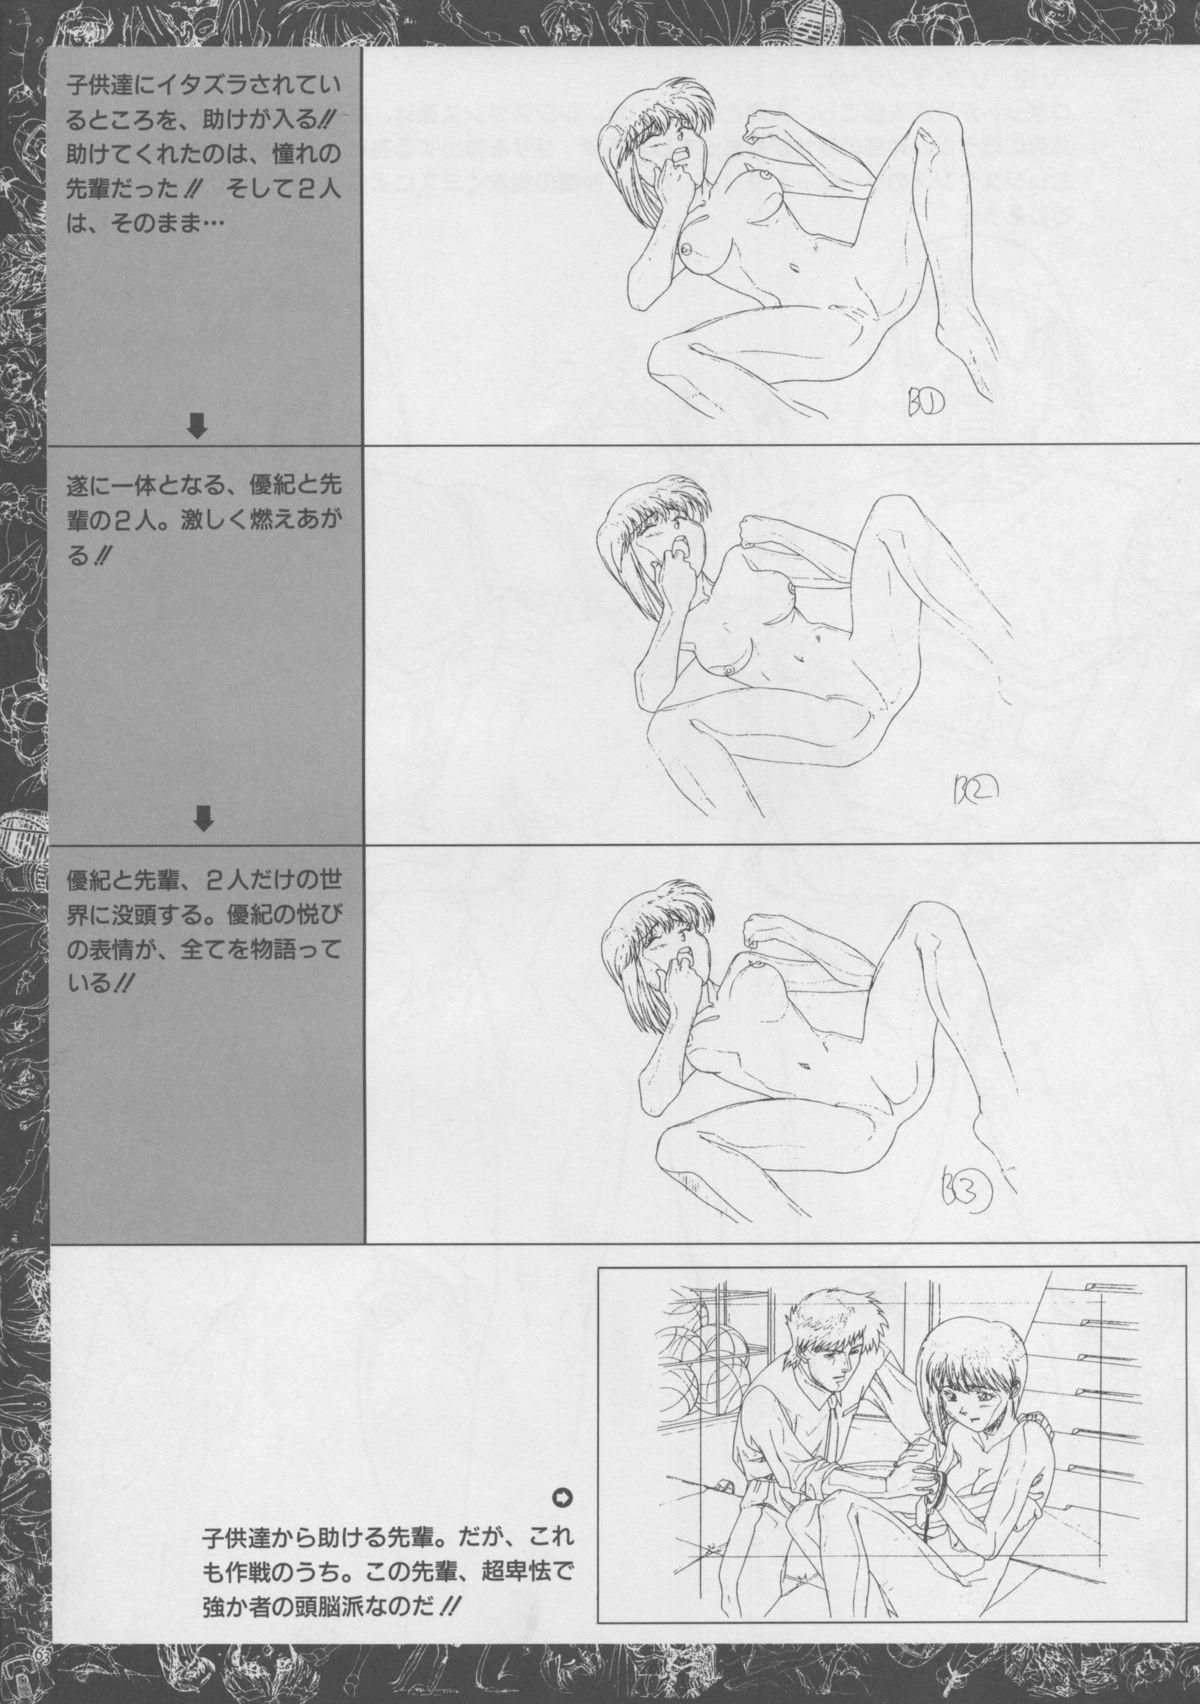 VIPER Series Official Artbook 61